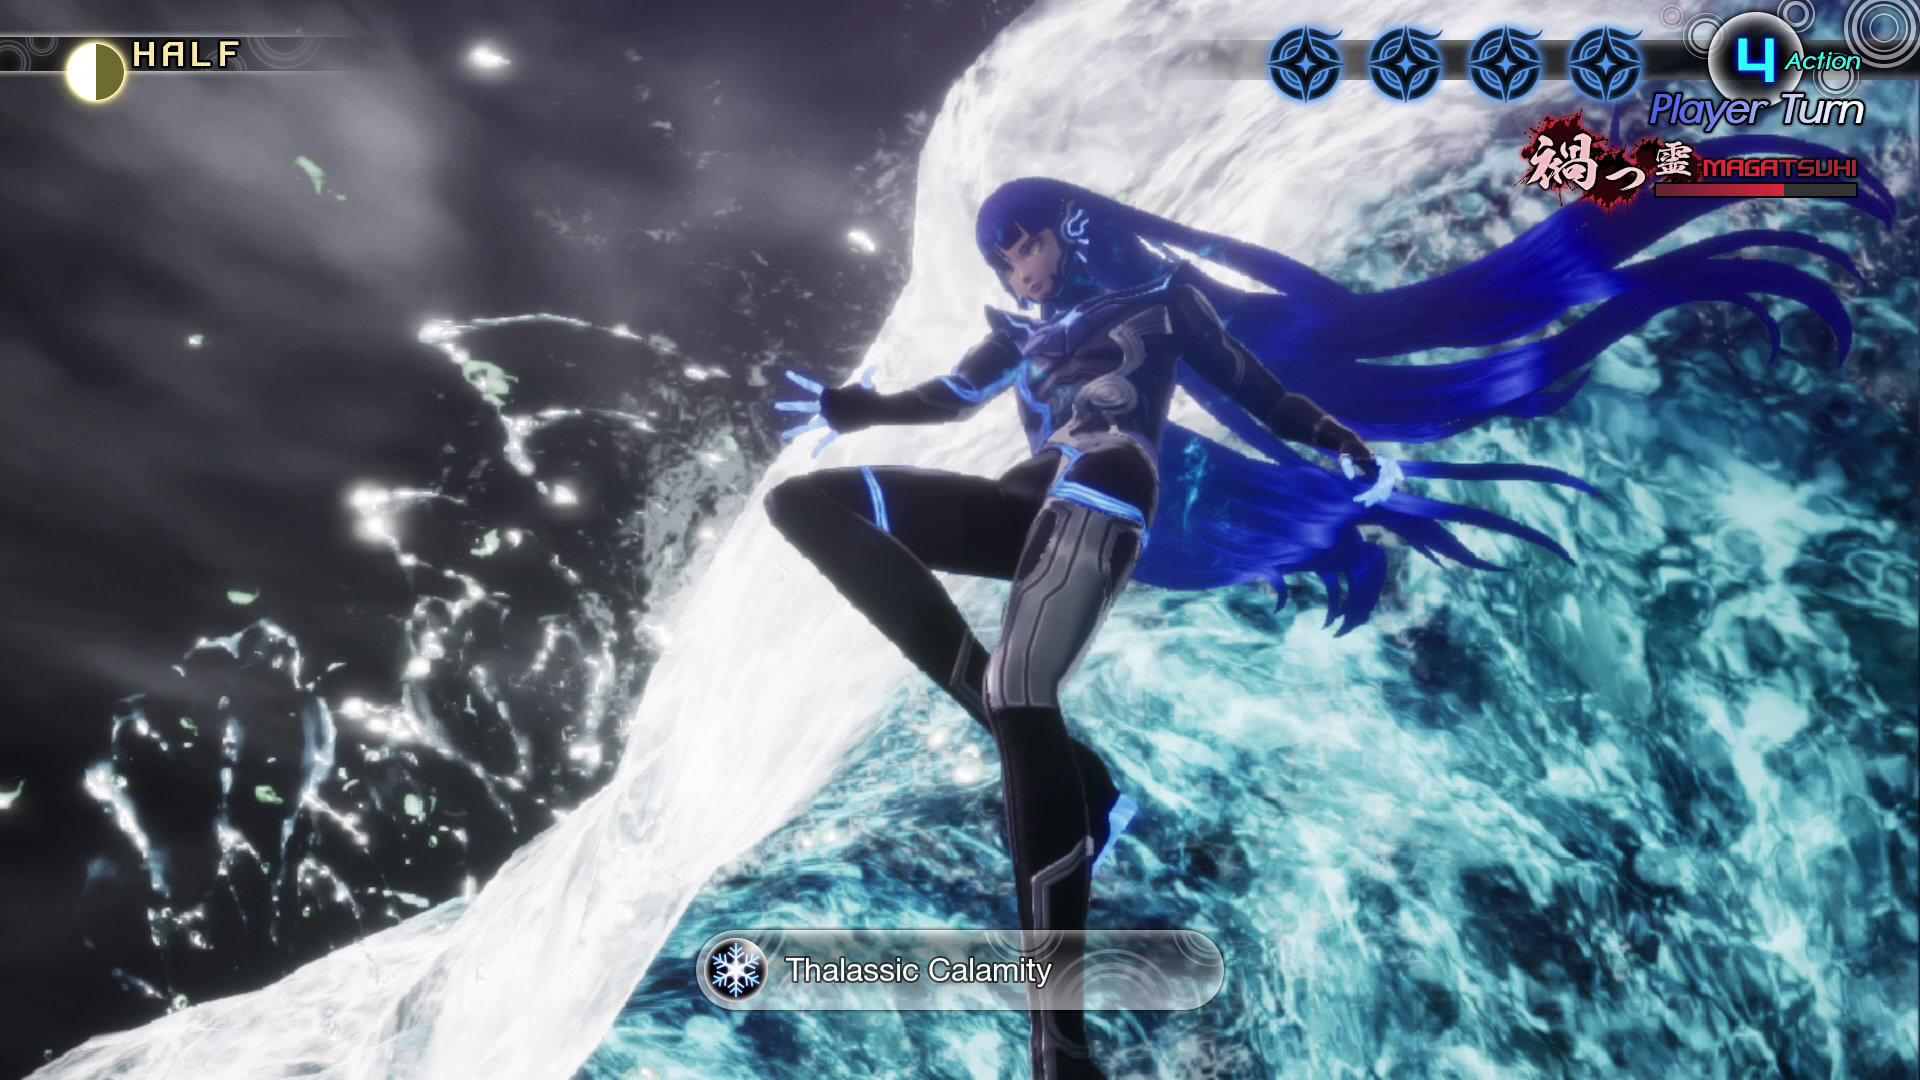 The Nahobino, protagonist of Shin Megami Tensei V, rides a blue and white tidal wave.